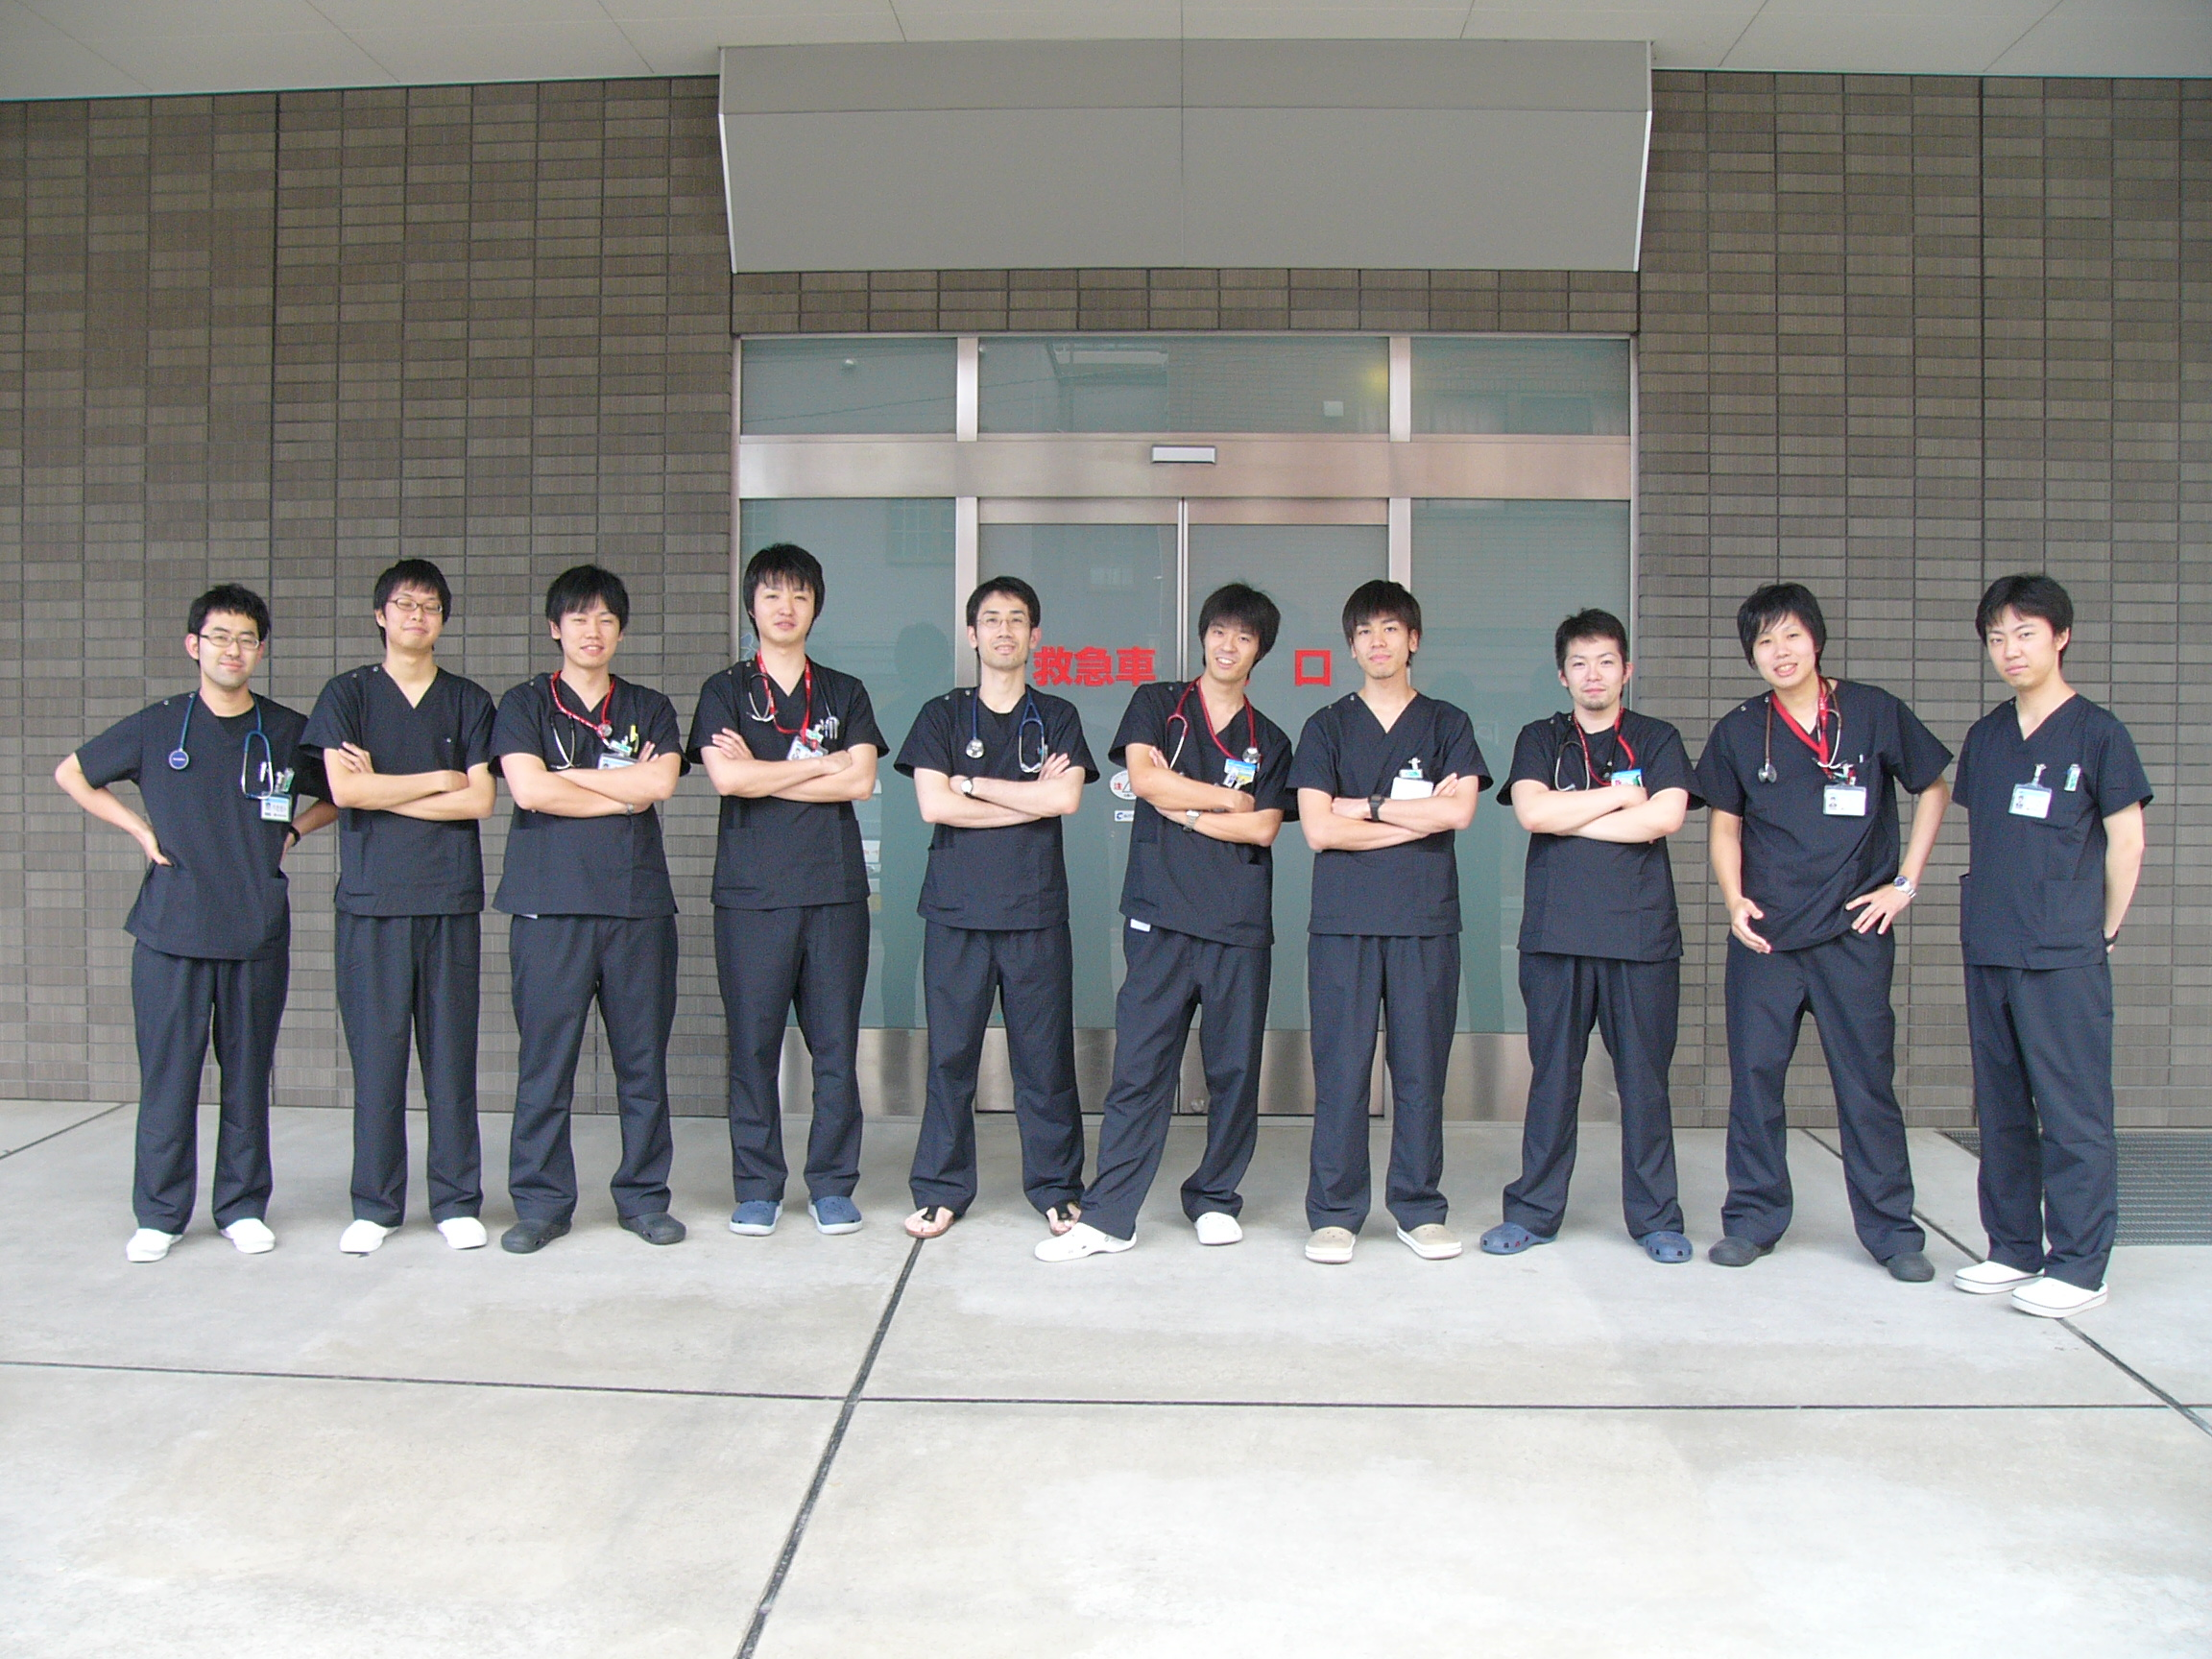 http://blog.higashi-tokushukai.or.jp/ydblog/P1130042.JPG